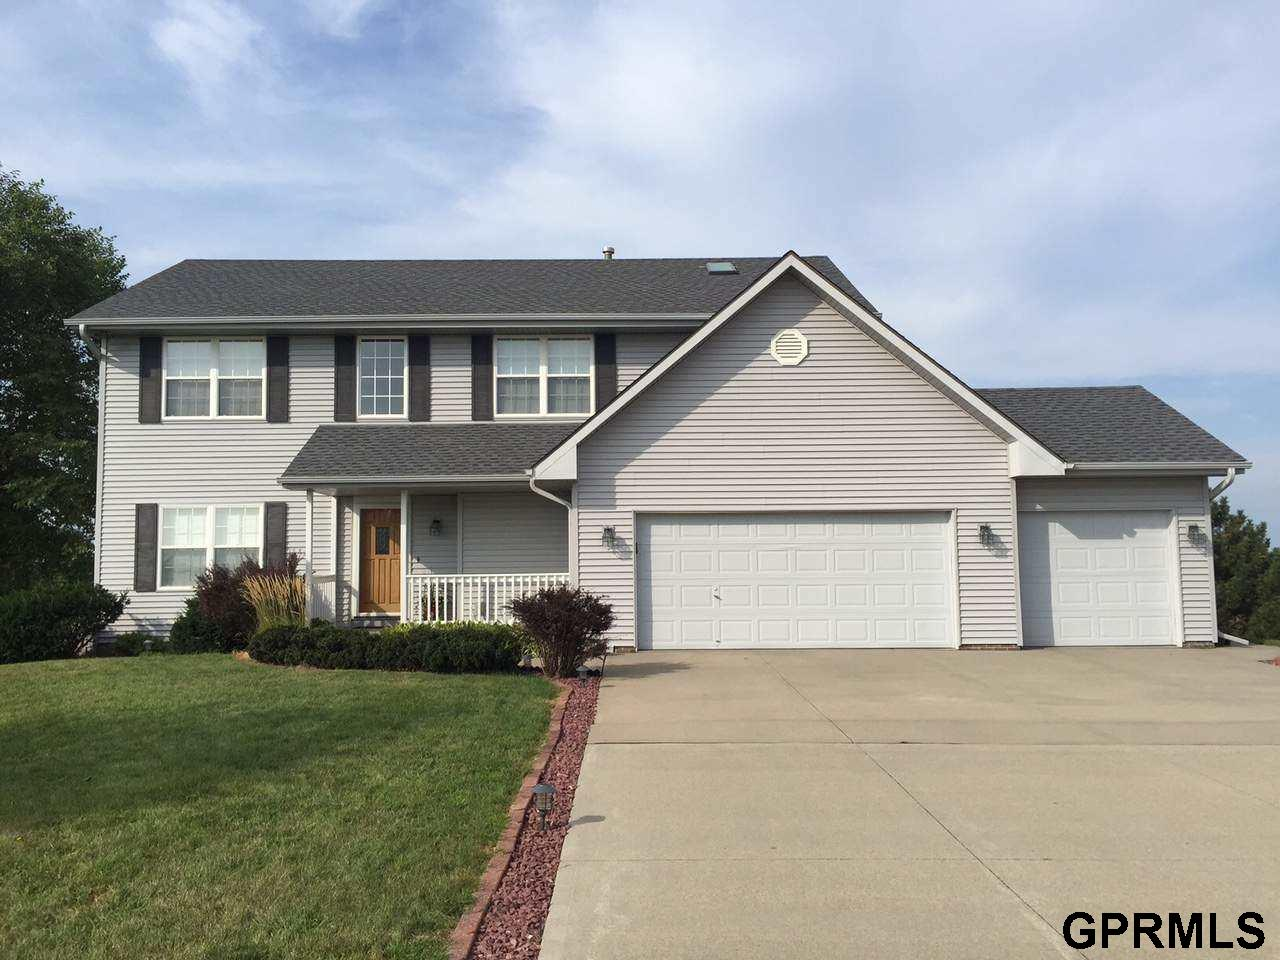 Real Estate for Sale, ListingId: 34965453, Blair,NE68008